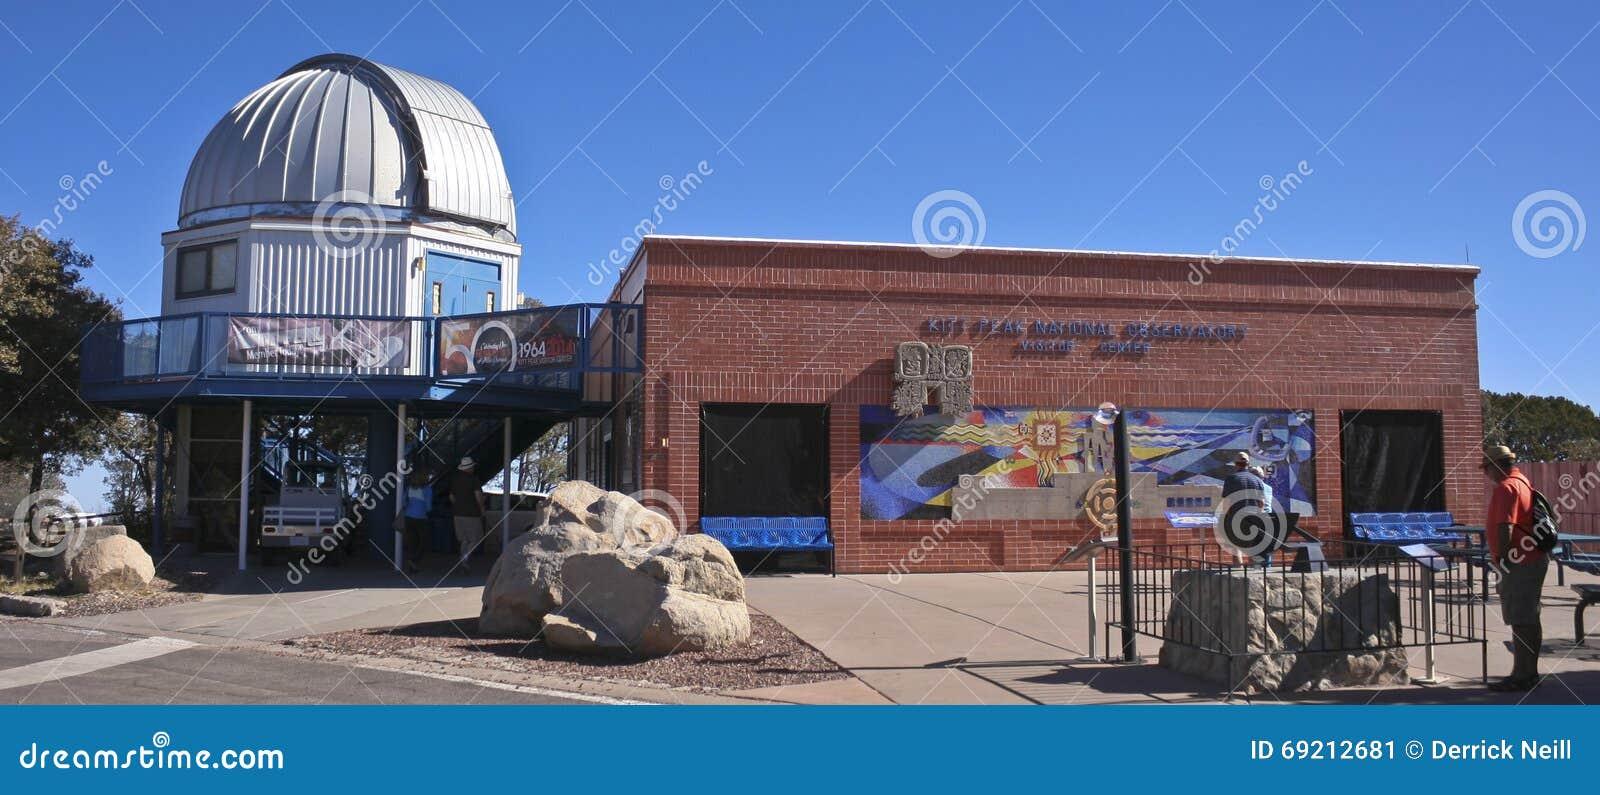 40ec52c69f0ab5 A Kitt Peak National Observatory Visitor Center Editorial Photo ...